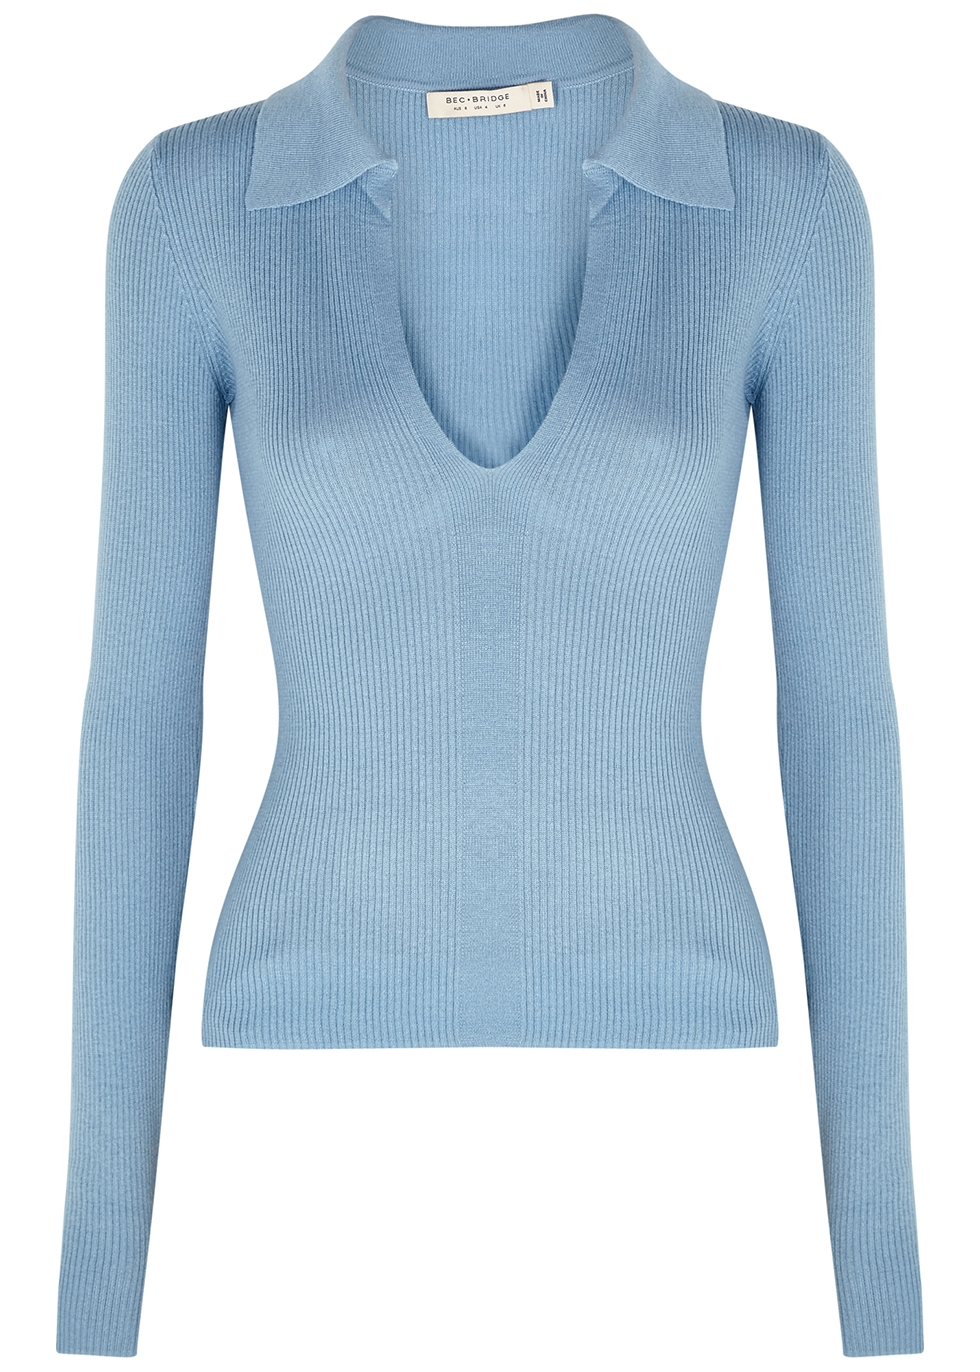 Freya blue ribbed-knit jumper